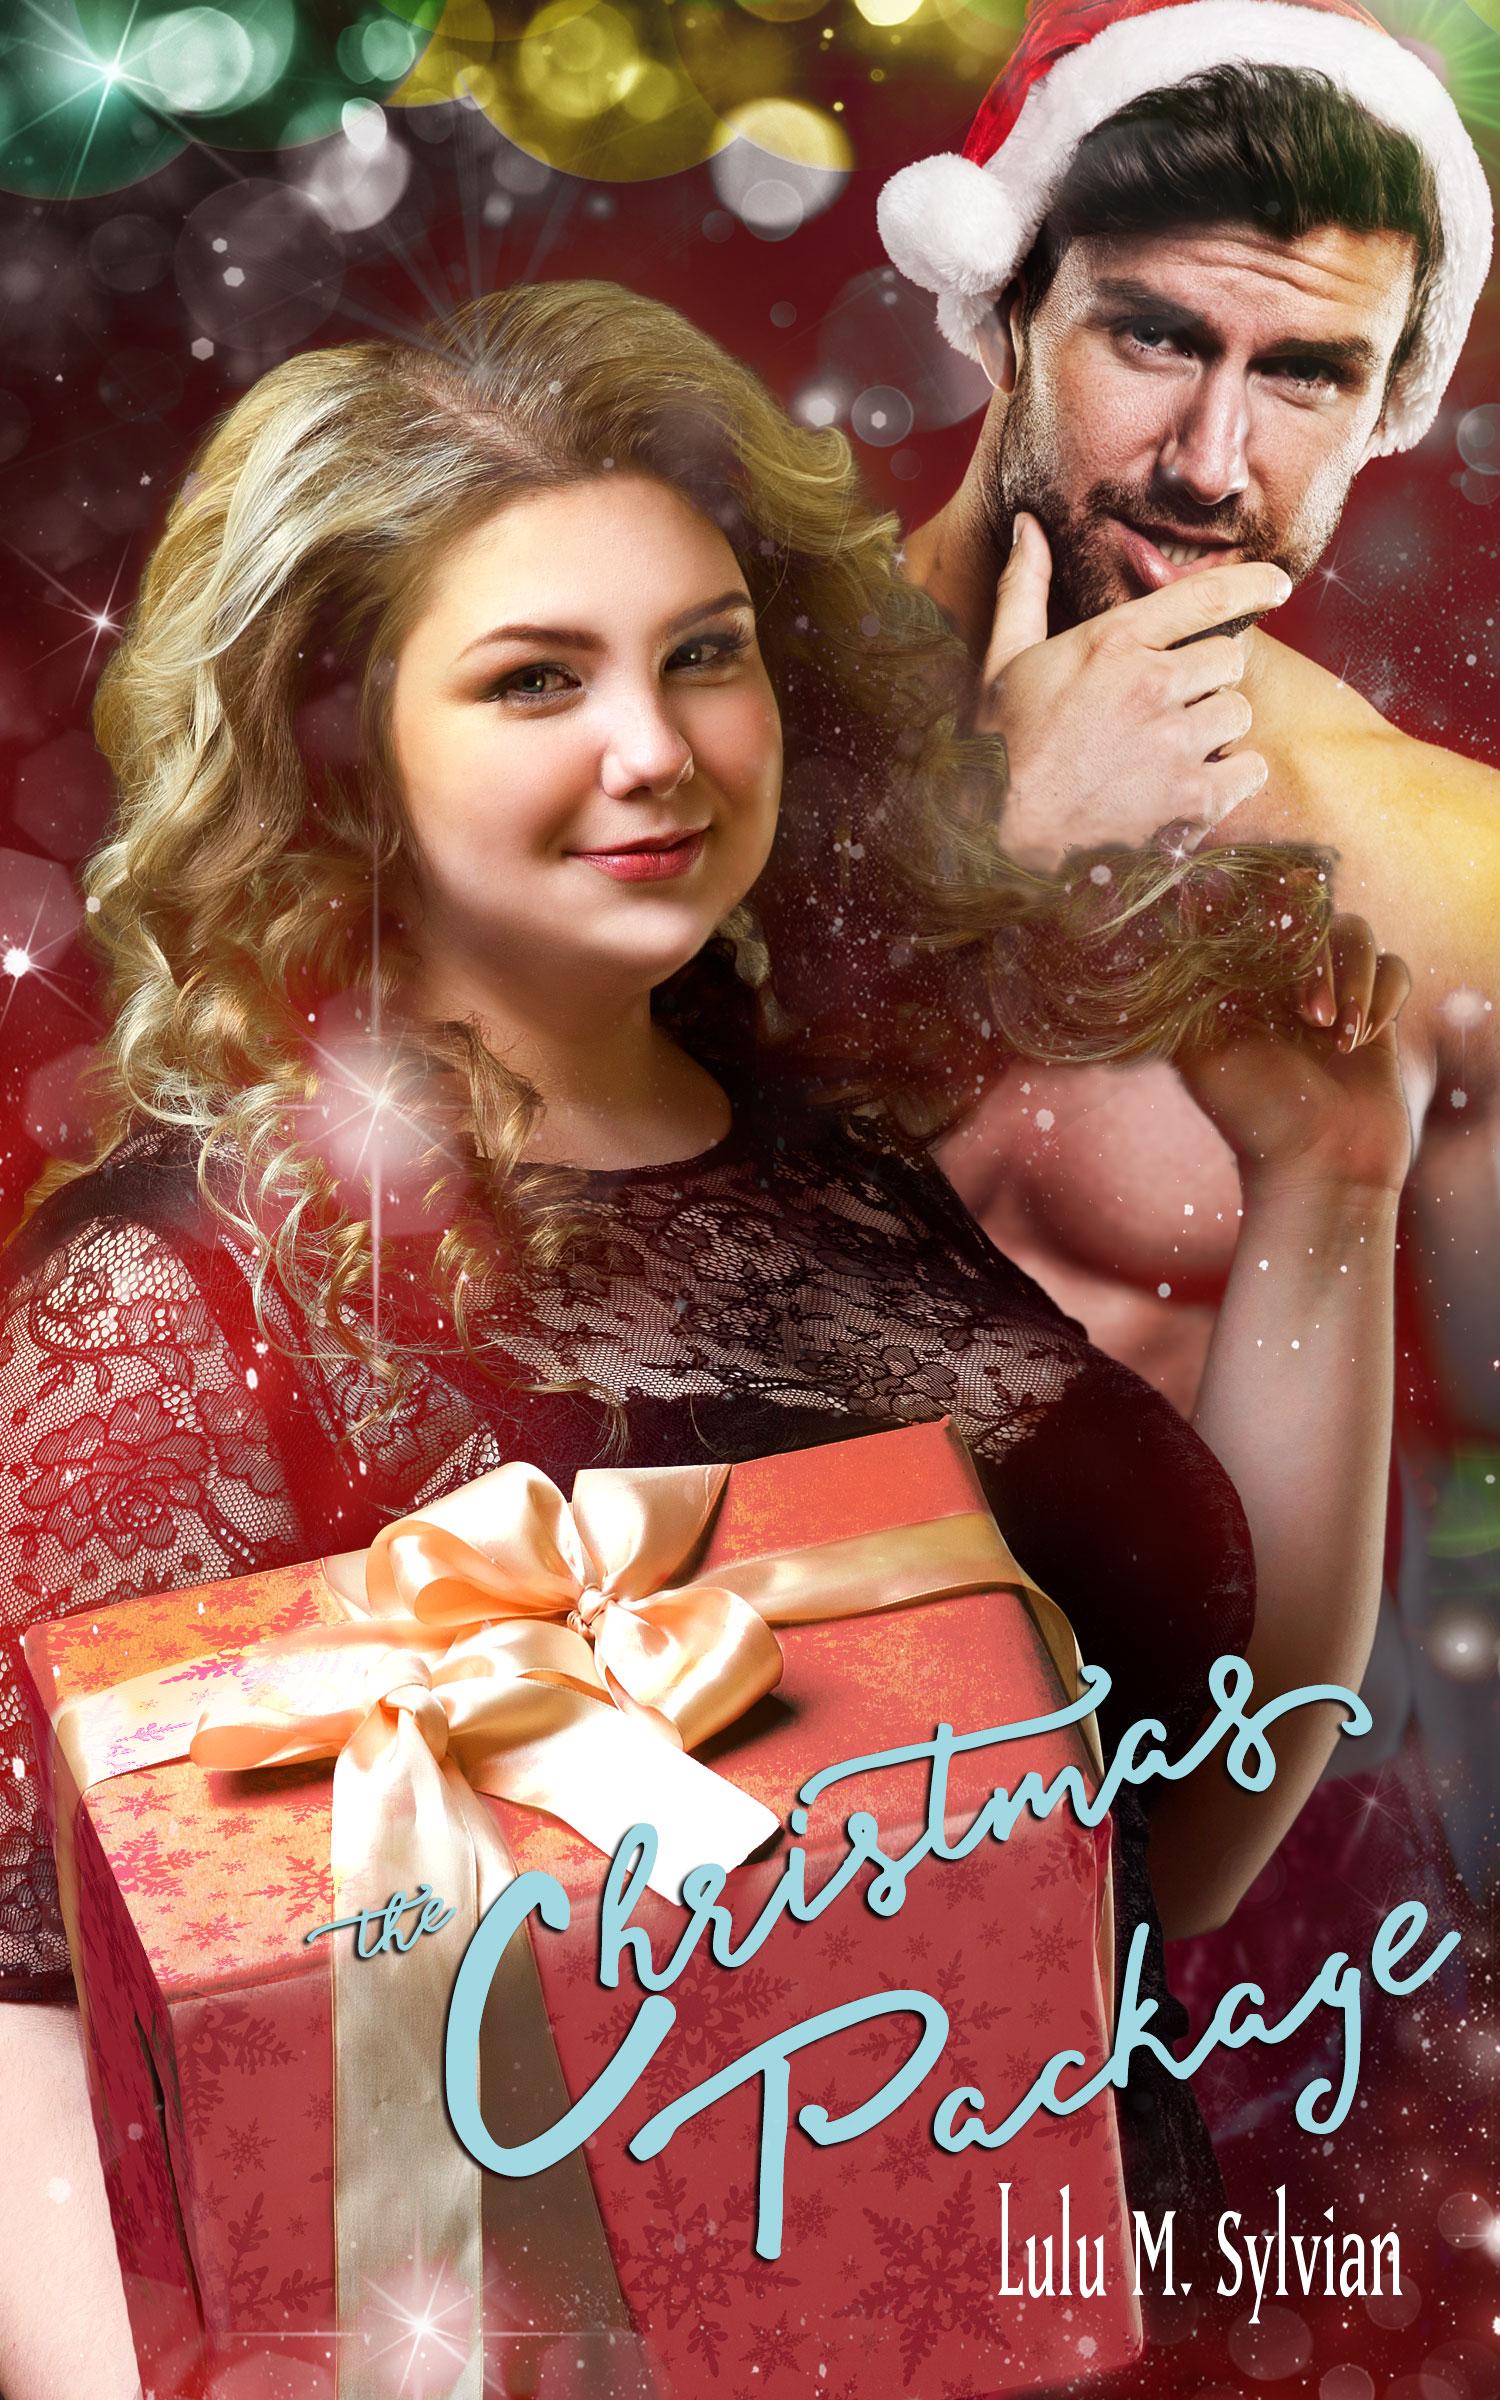 christmaspackagecover